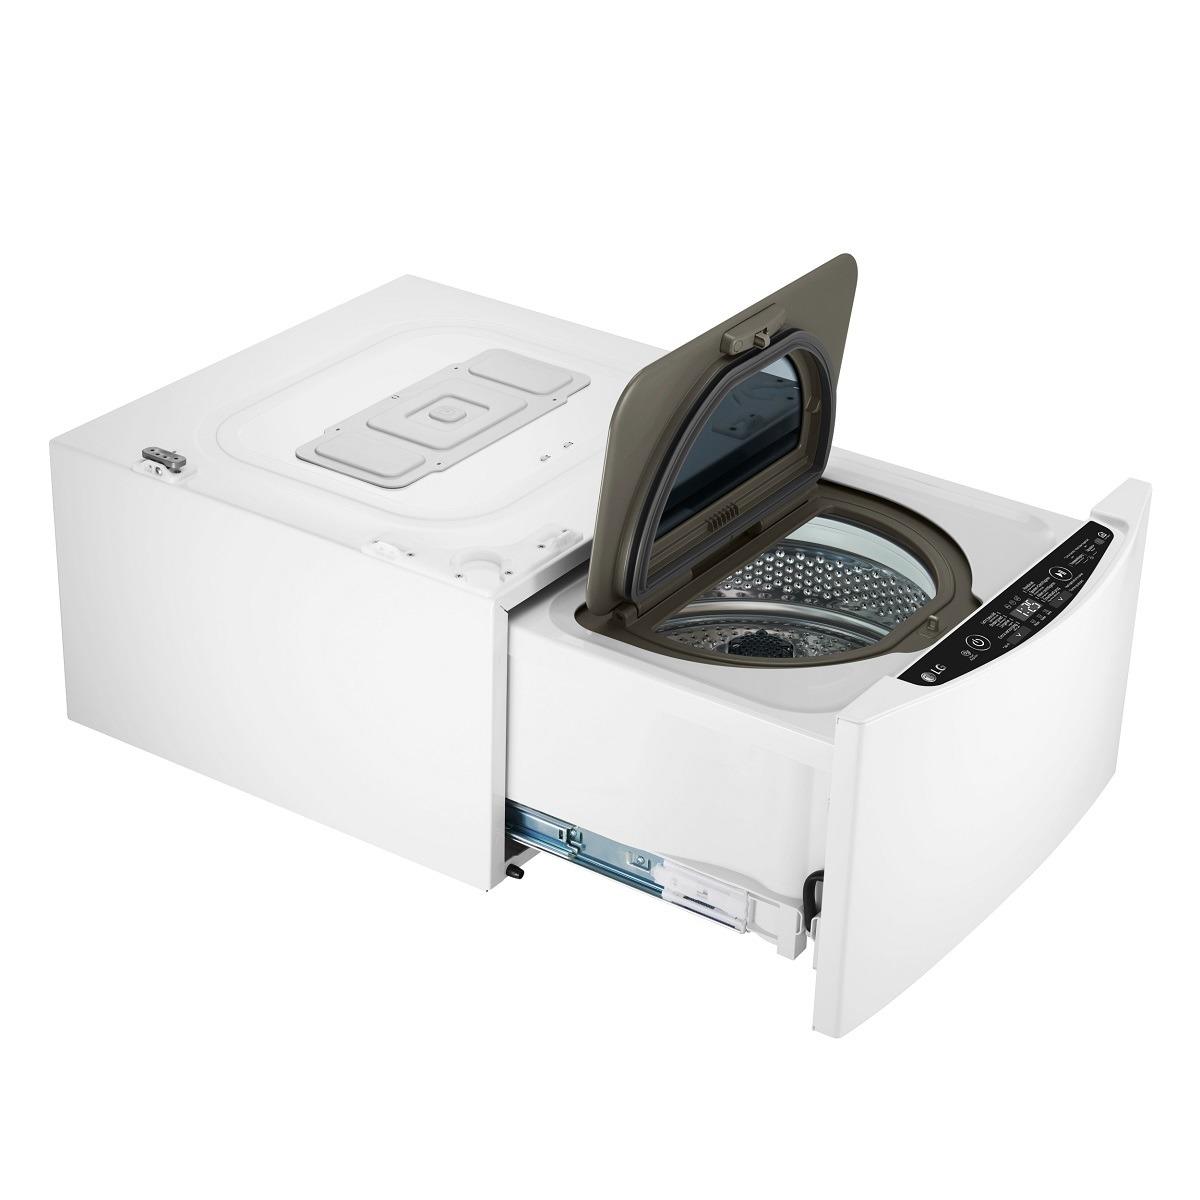 LG TWINWash mini FH8G1MINI wasmachine bovenlader